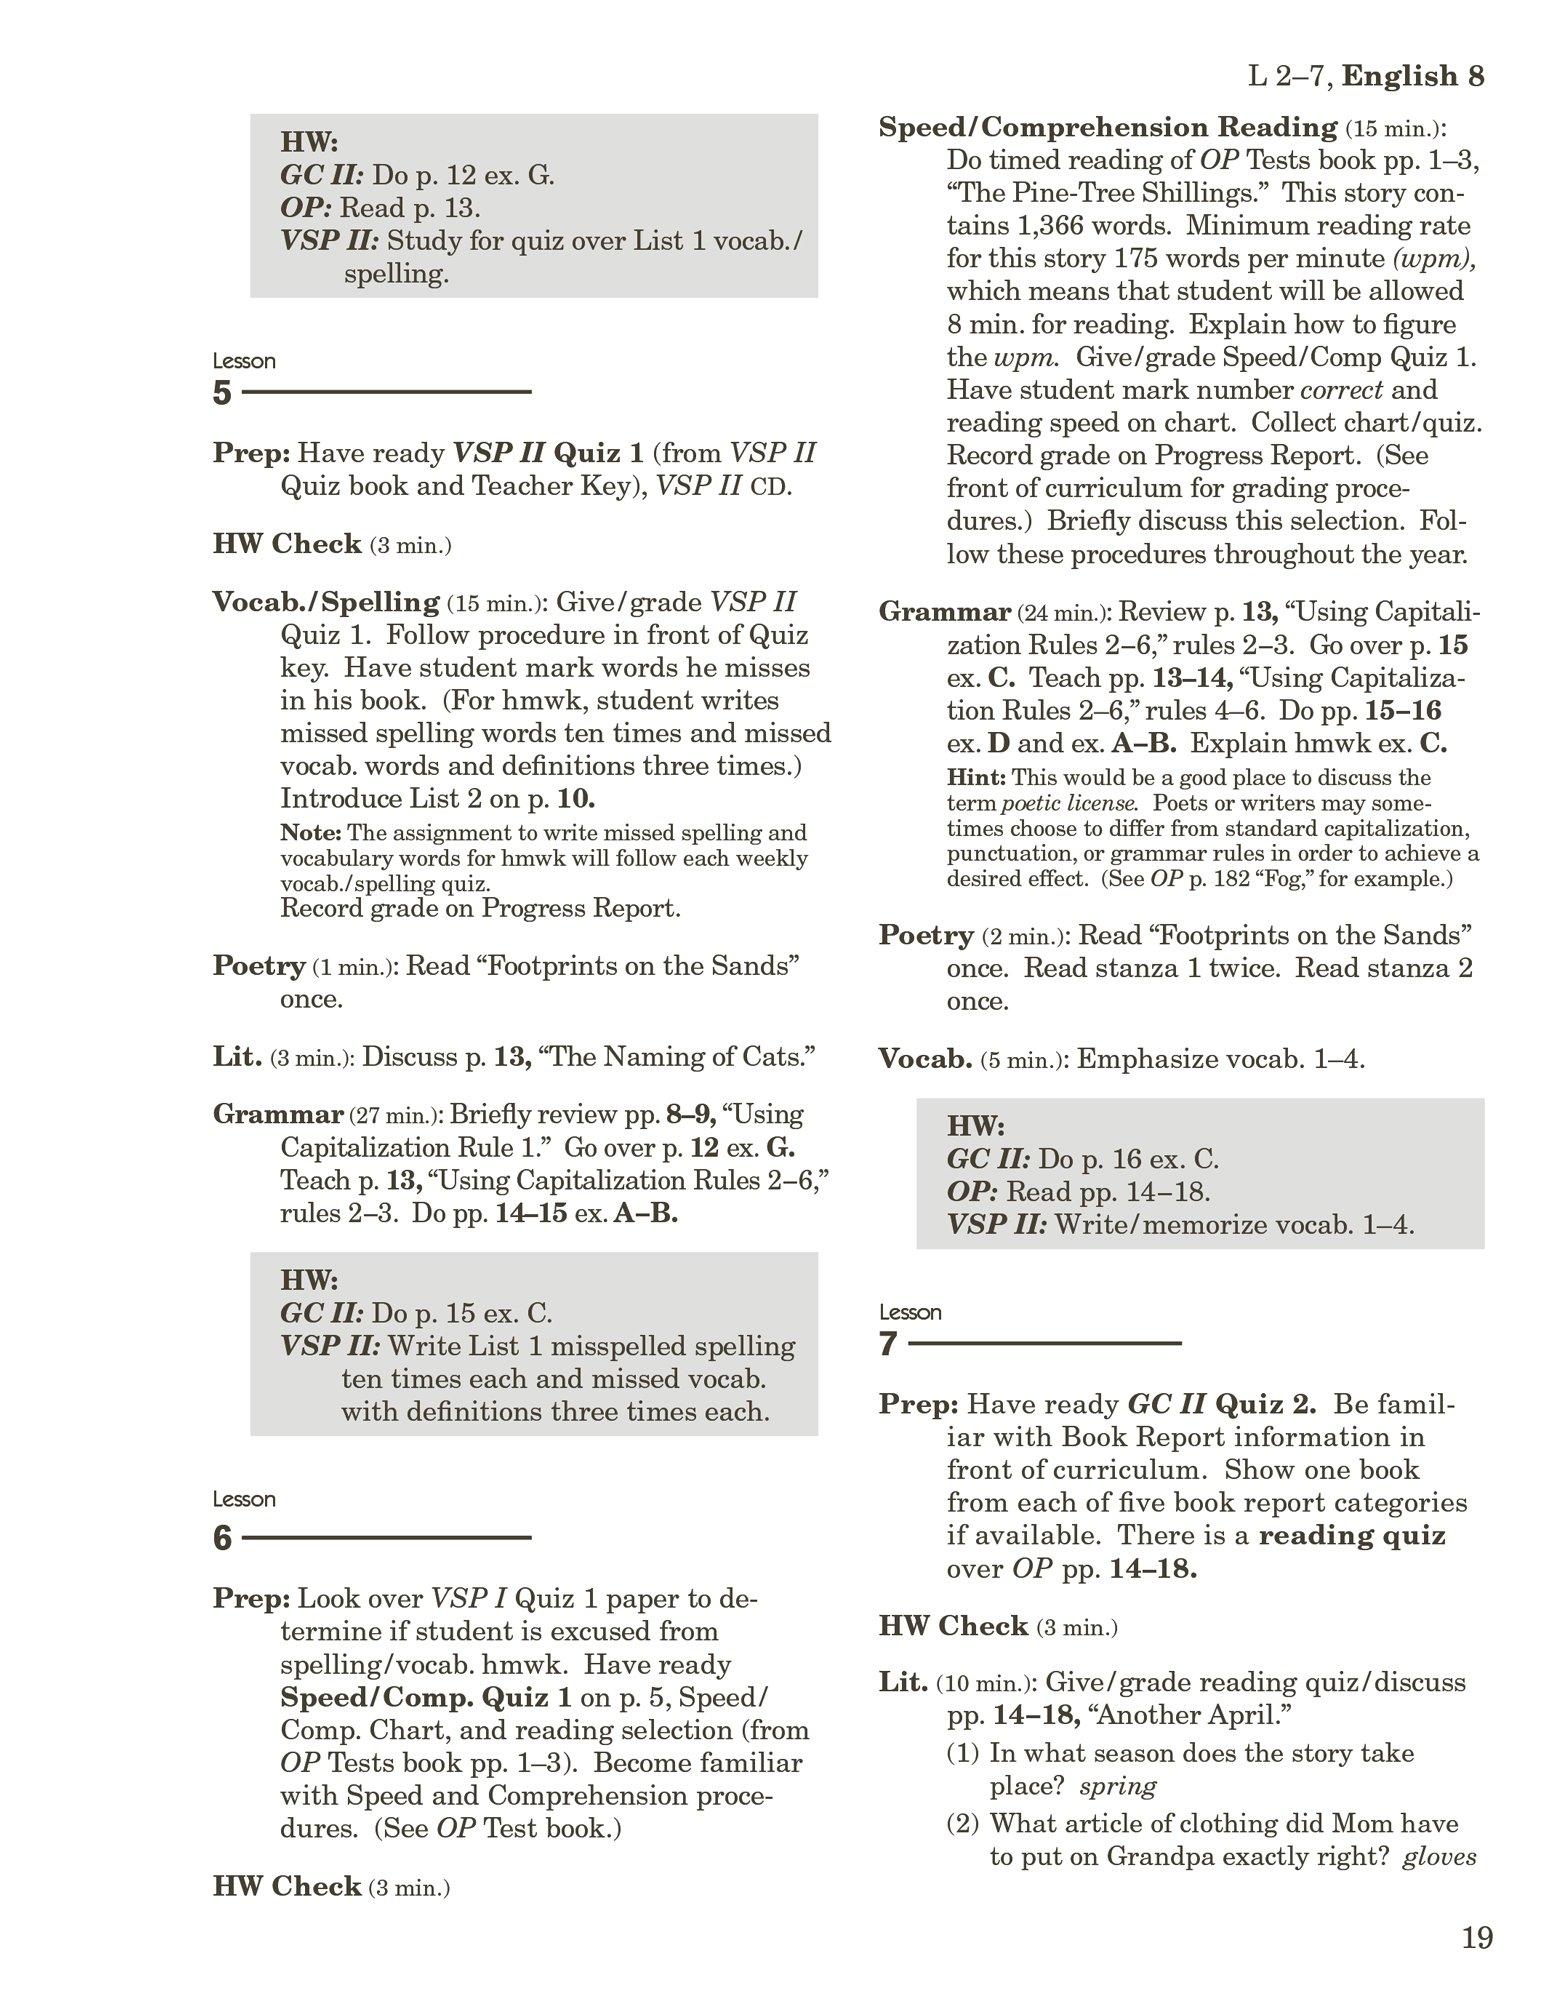 Homeschool English 8 Curriculum/Lesson Plans: Abeka: Amazon com: Books